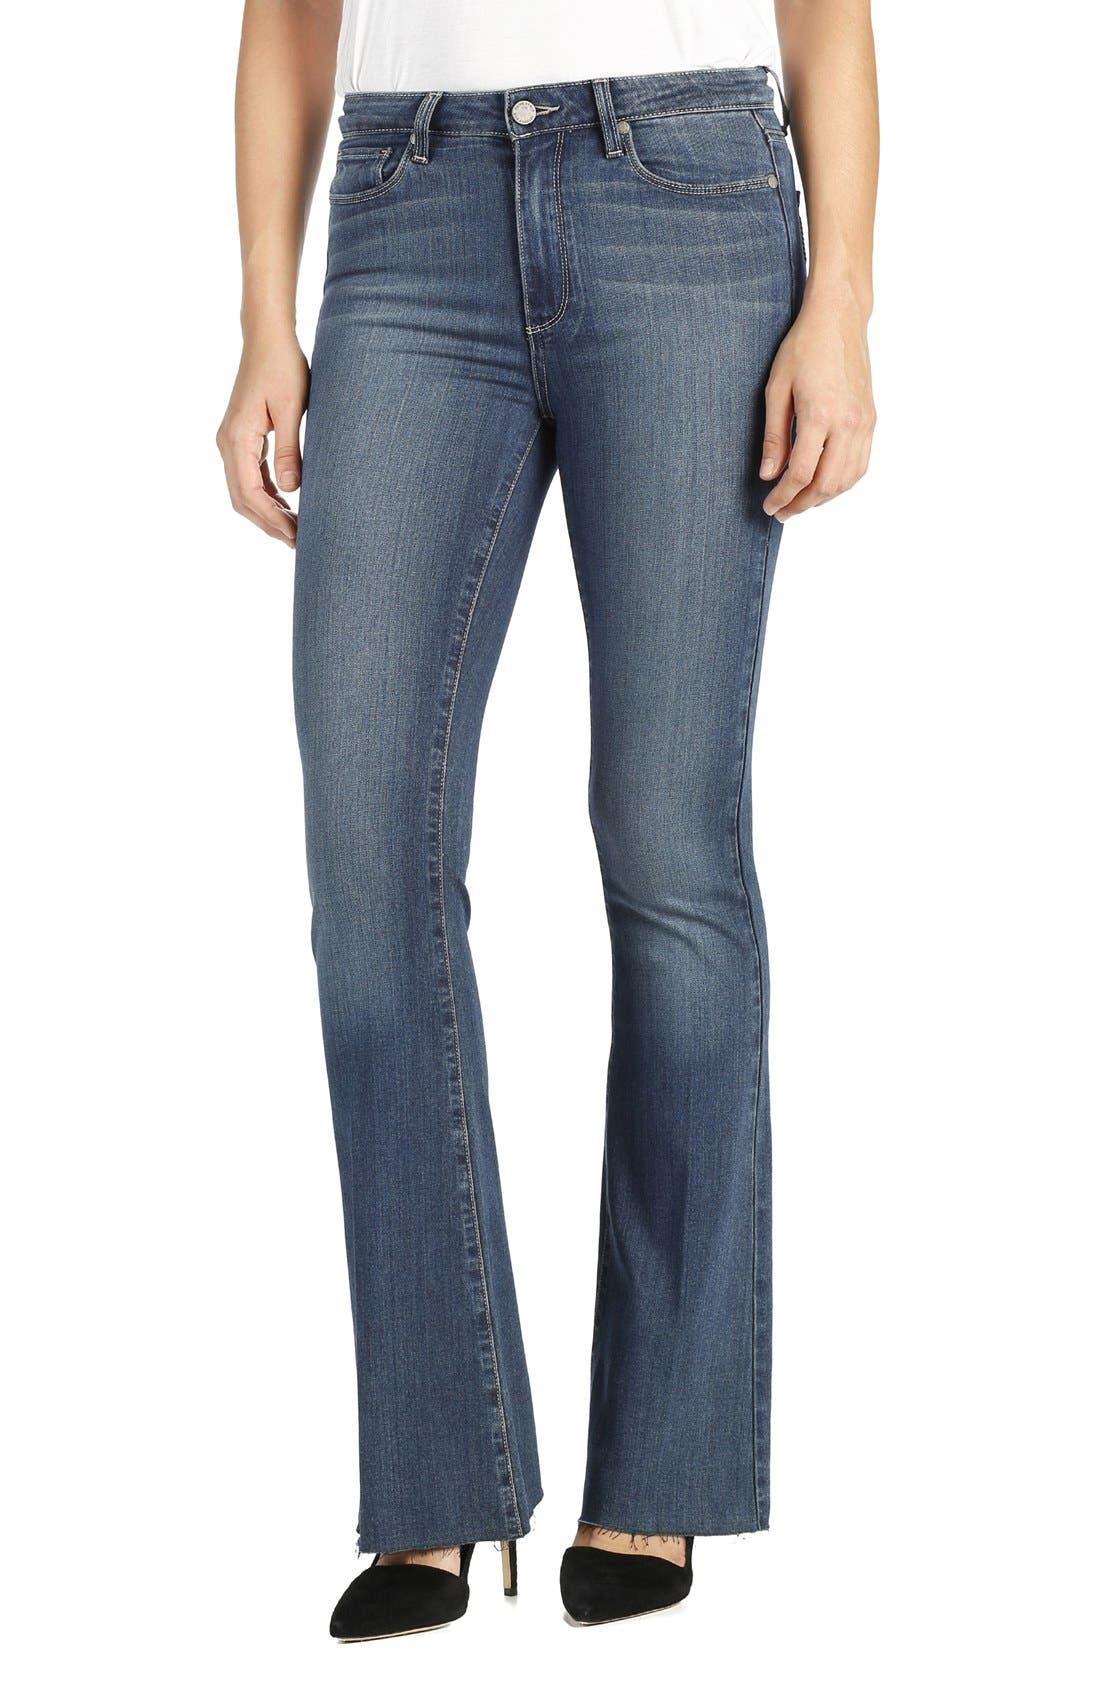 Main Image - PAIGE Transcend - Bell Canyon High Waist Raw Hem Flare Jeans (Giona)